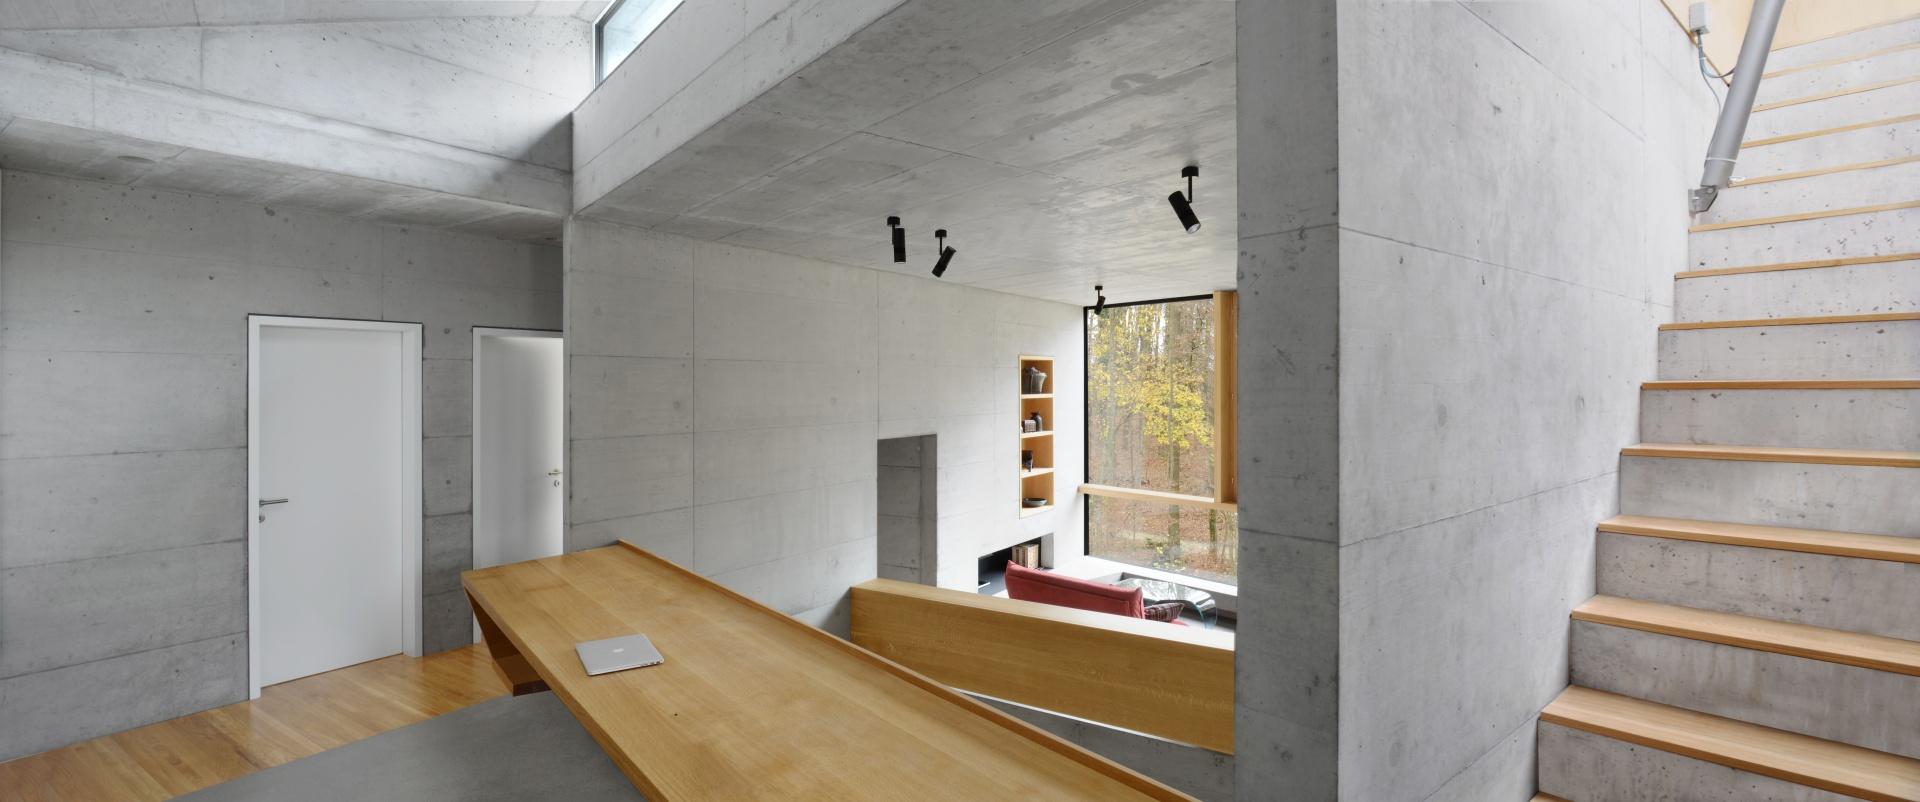 Büro_Treppe Dachterrasse © Daluz Gonzalez Architekten